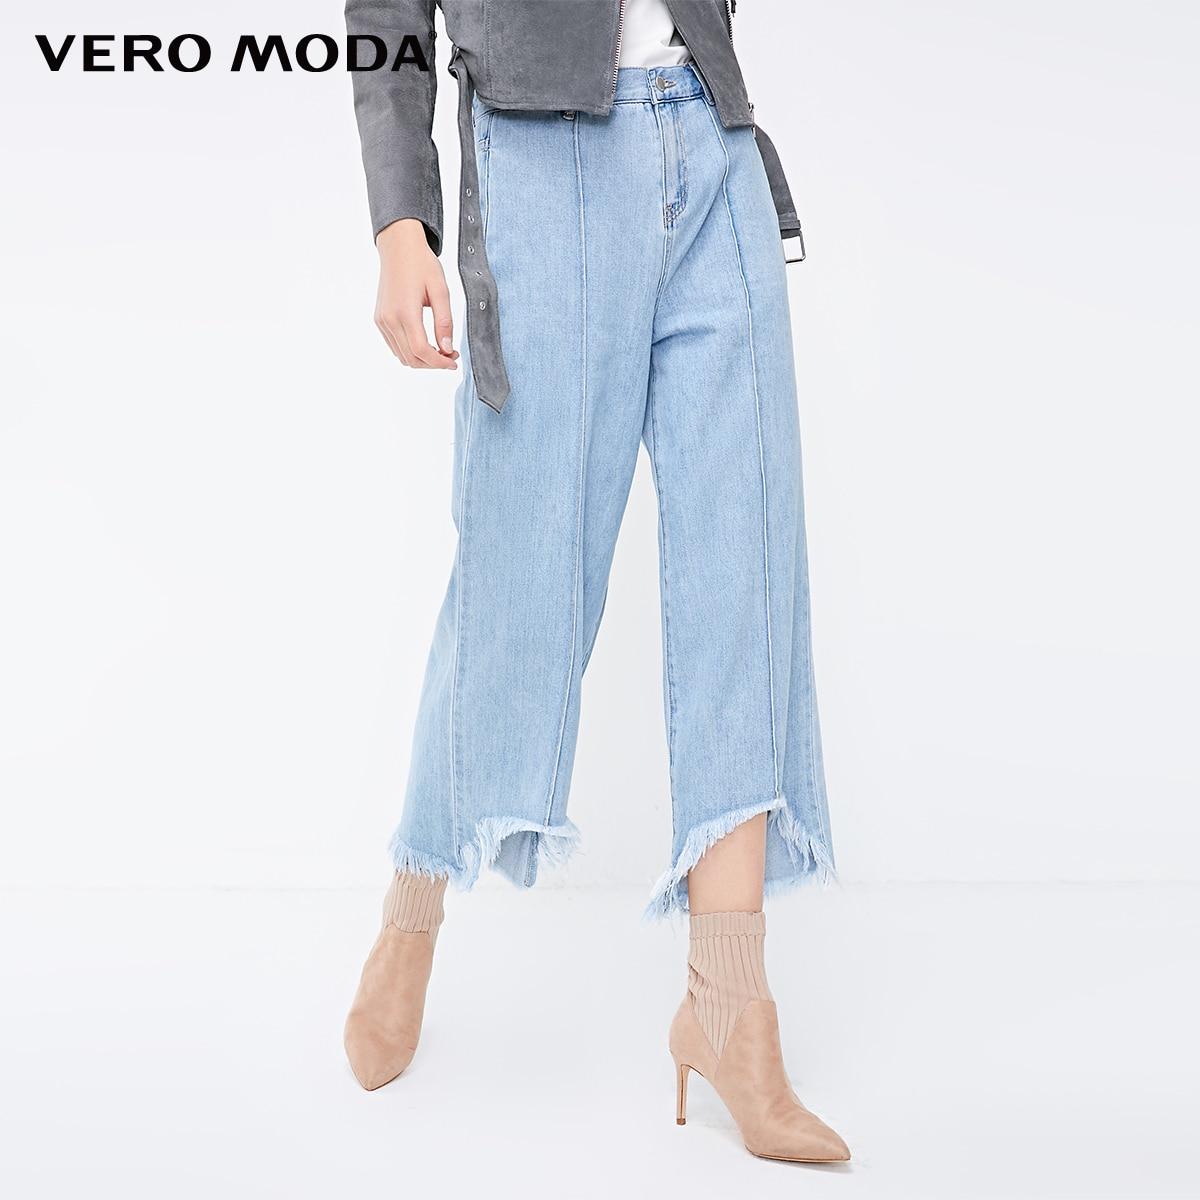 Vero Moda 2019 New Arrivals Women's Washed Fading Raw-edge Cuffs Crop Jeans | 318349579